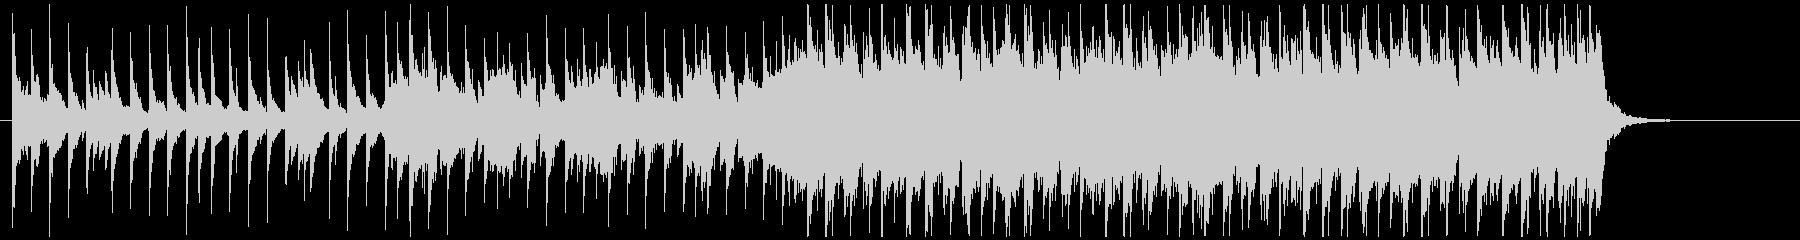 Mistrain / Intro's unreproduced waveform